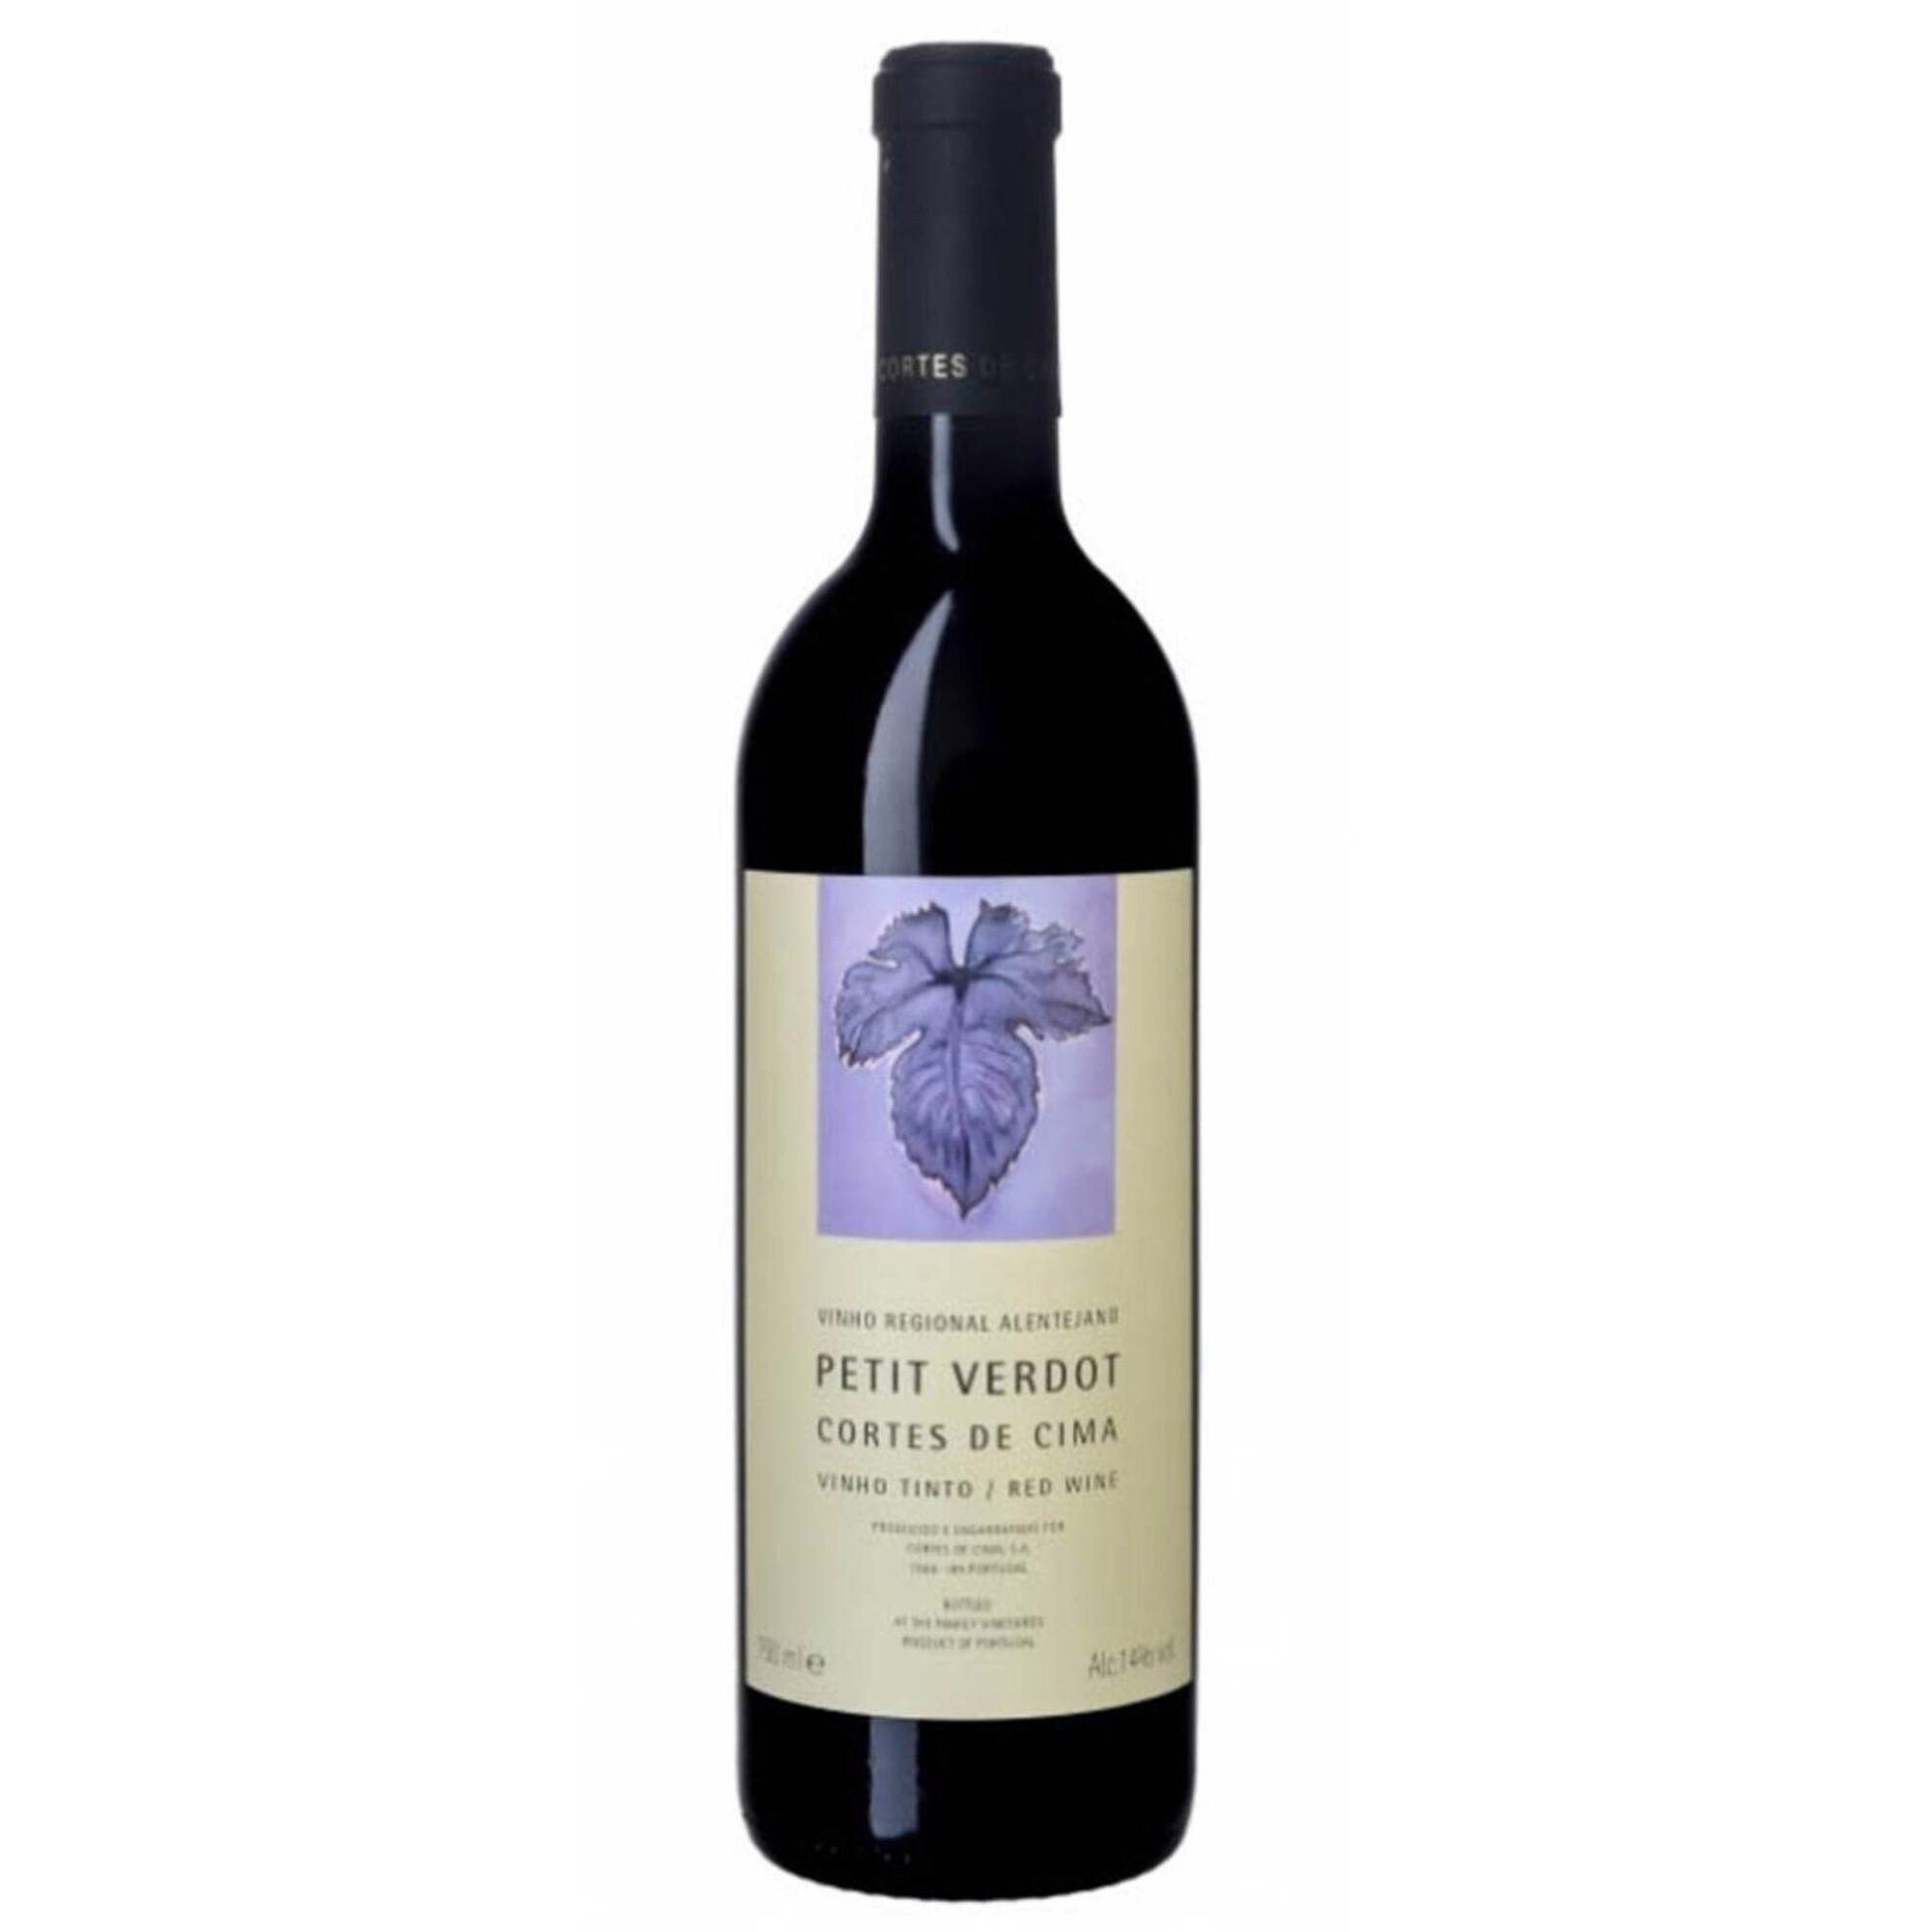 Cortes de Cima Petit Verdot Regional Alentejano Vinho Tinto